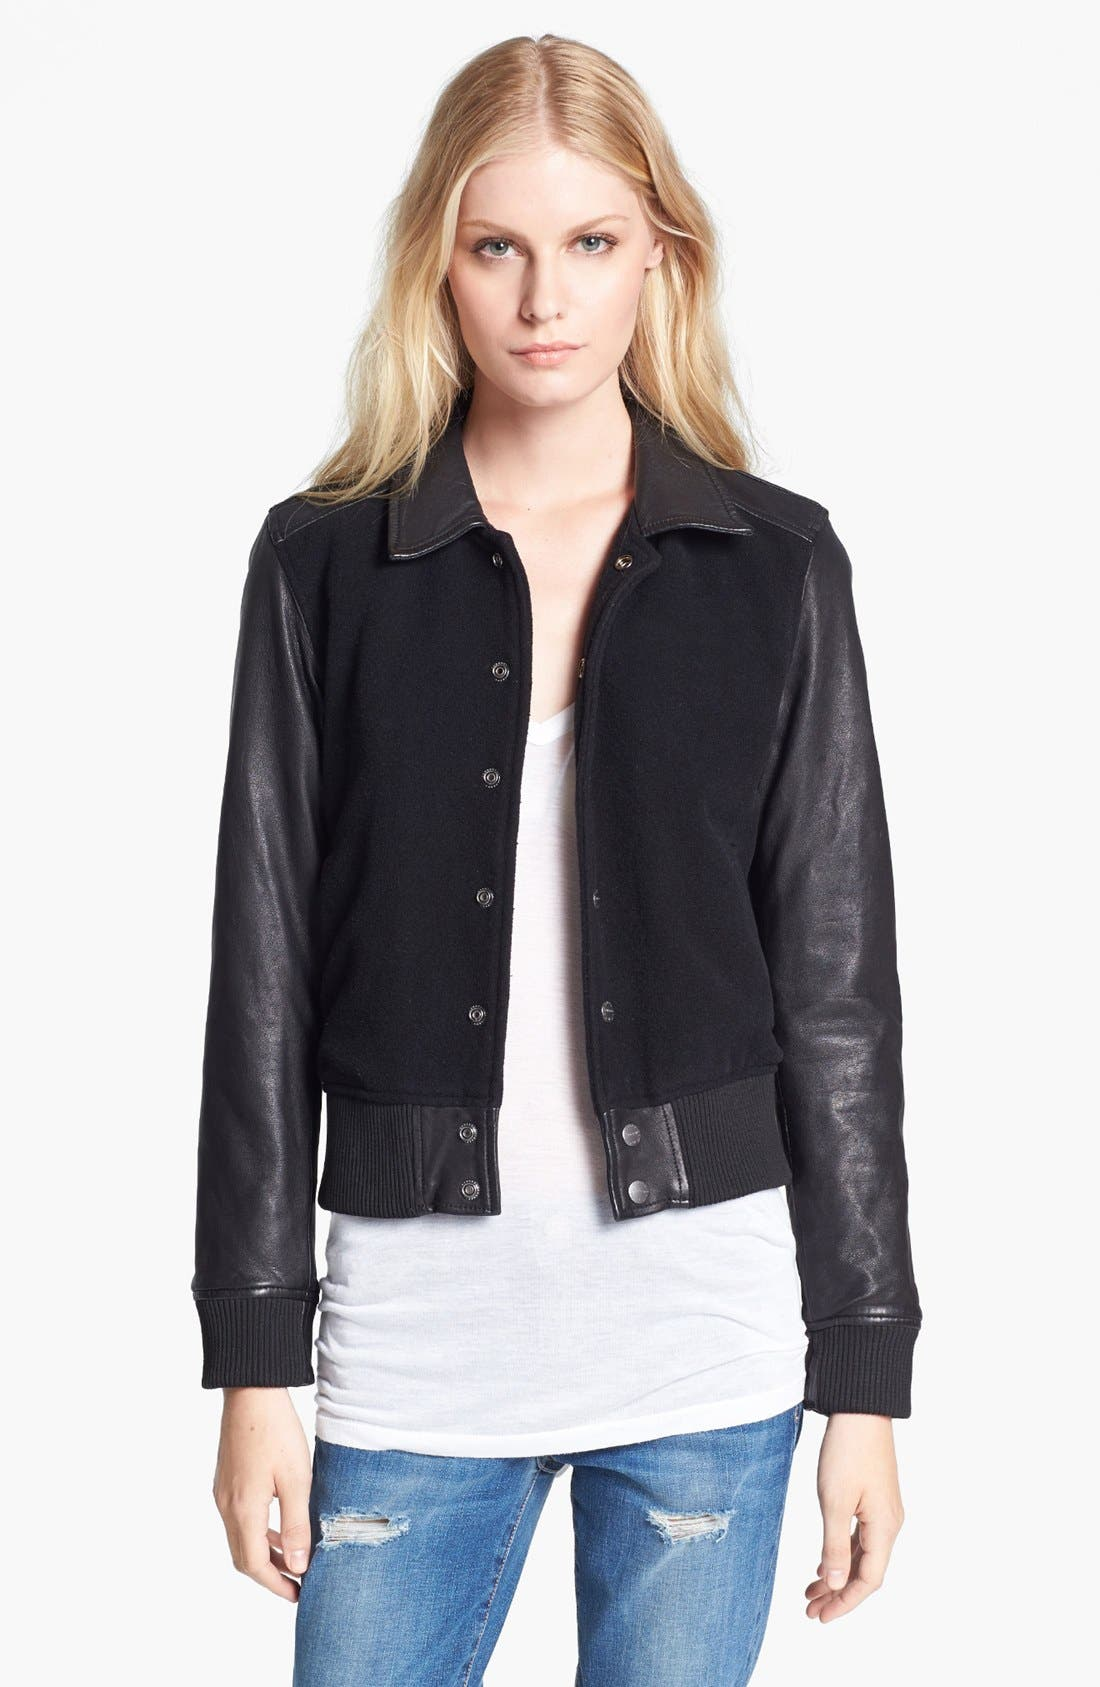 Main Image - Current/Elliott 'The Varsity' Jacket